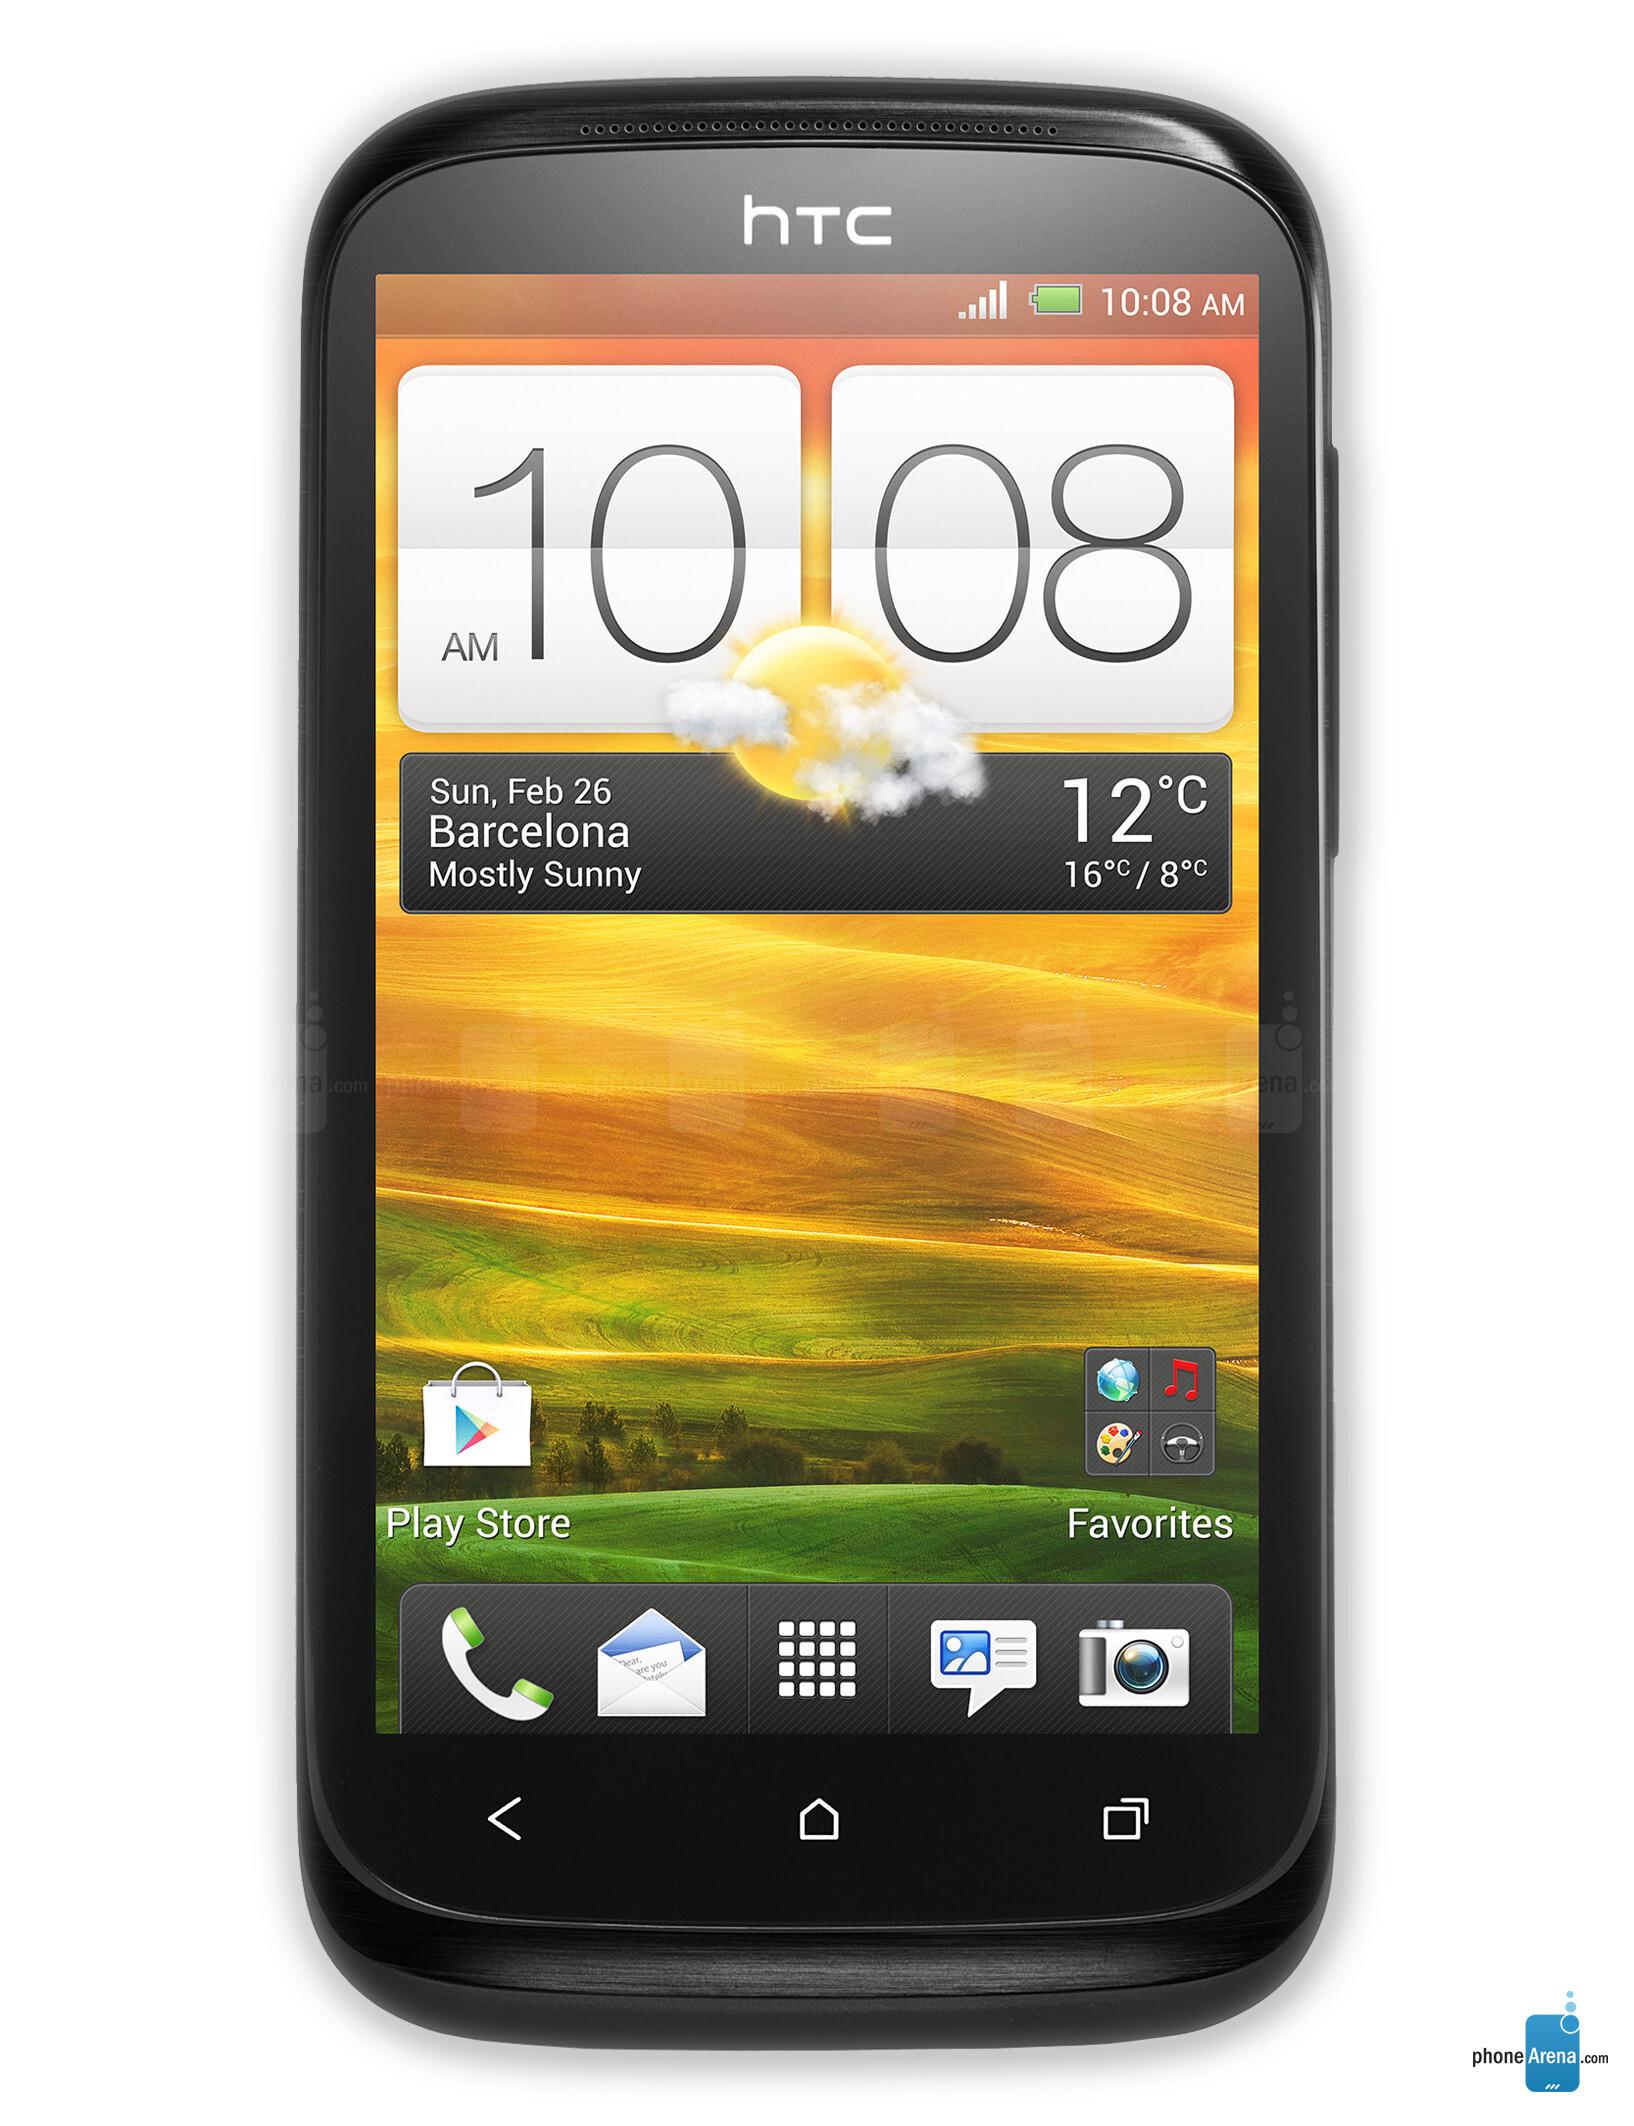 HTC Desire X - u0425u0430u0440u0430u043au0442u0435u0440u0438u0441u0442u0438u043au0438